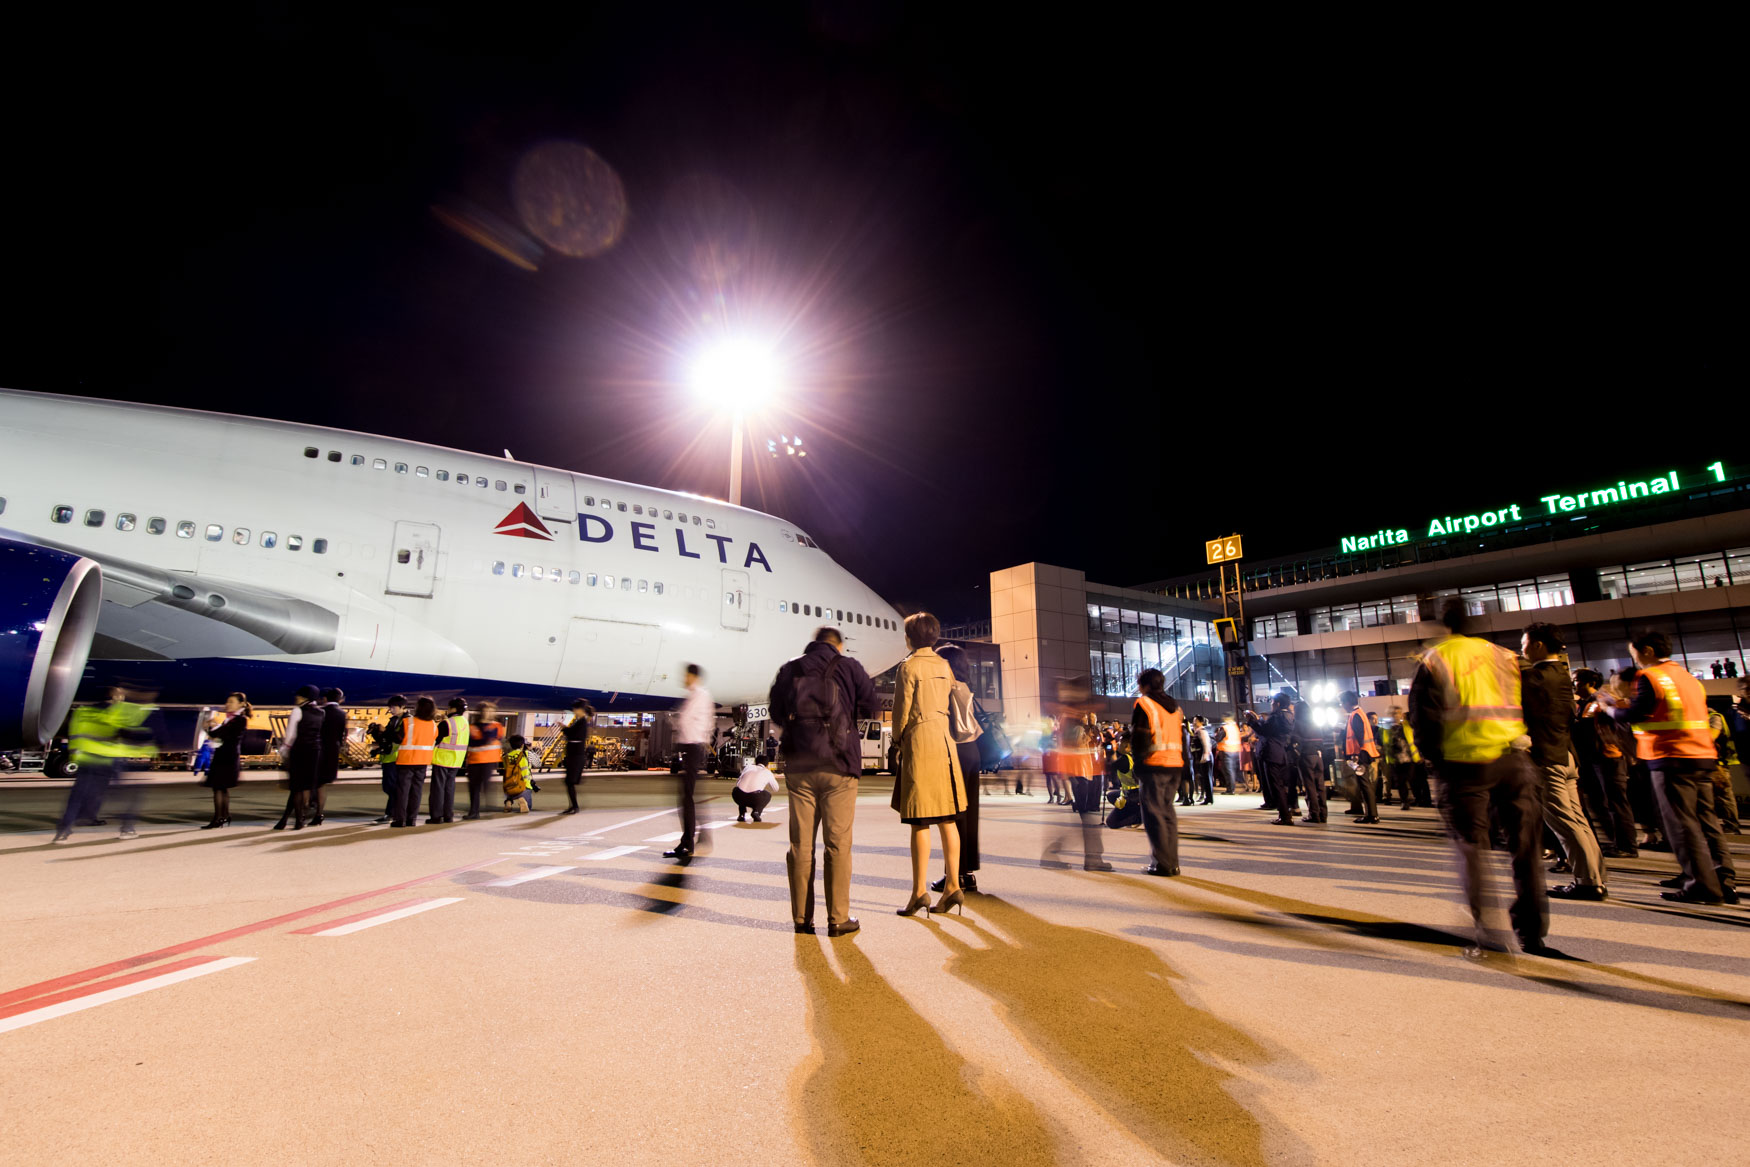 Delta Air Lines Narita Airport Terminal 1